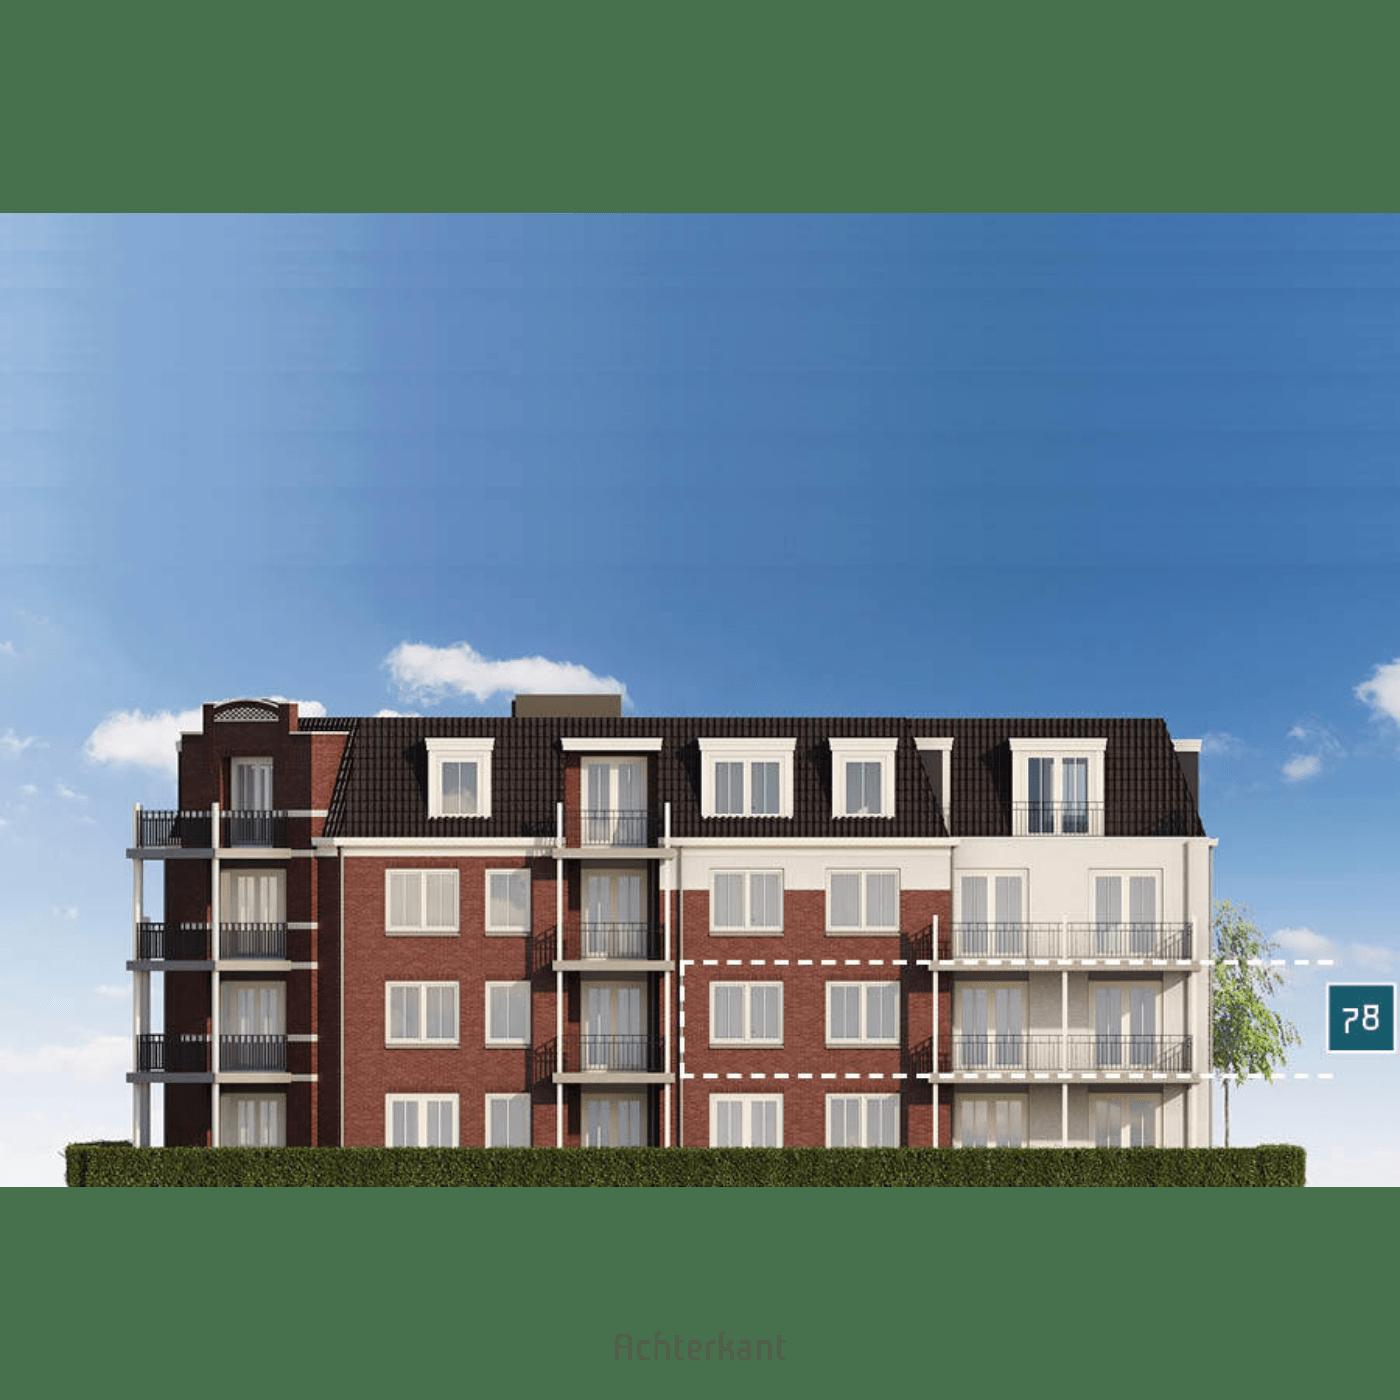 Huisdetail Appartementen 78